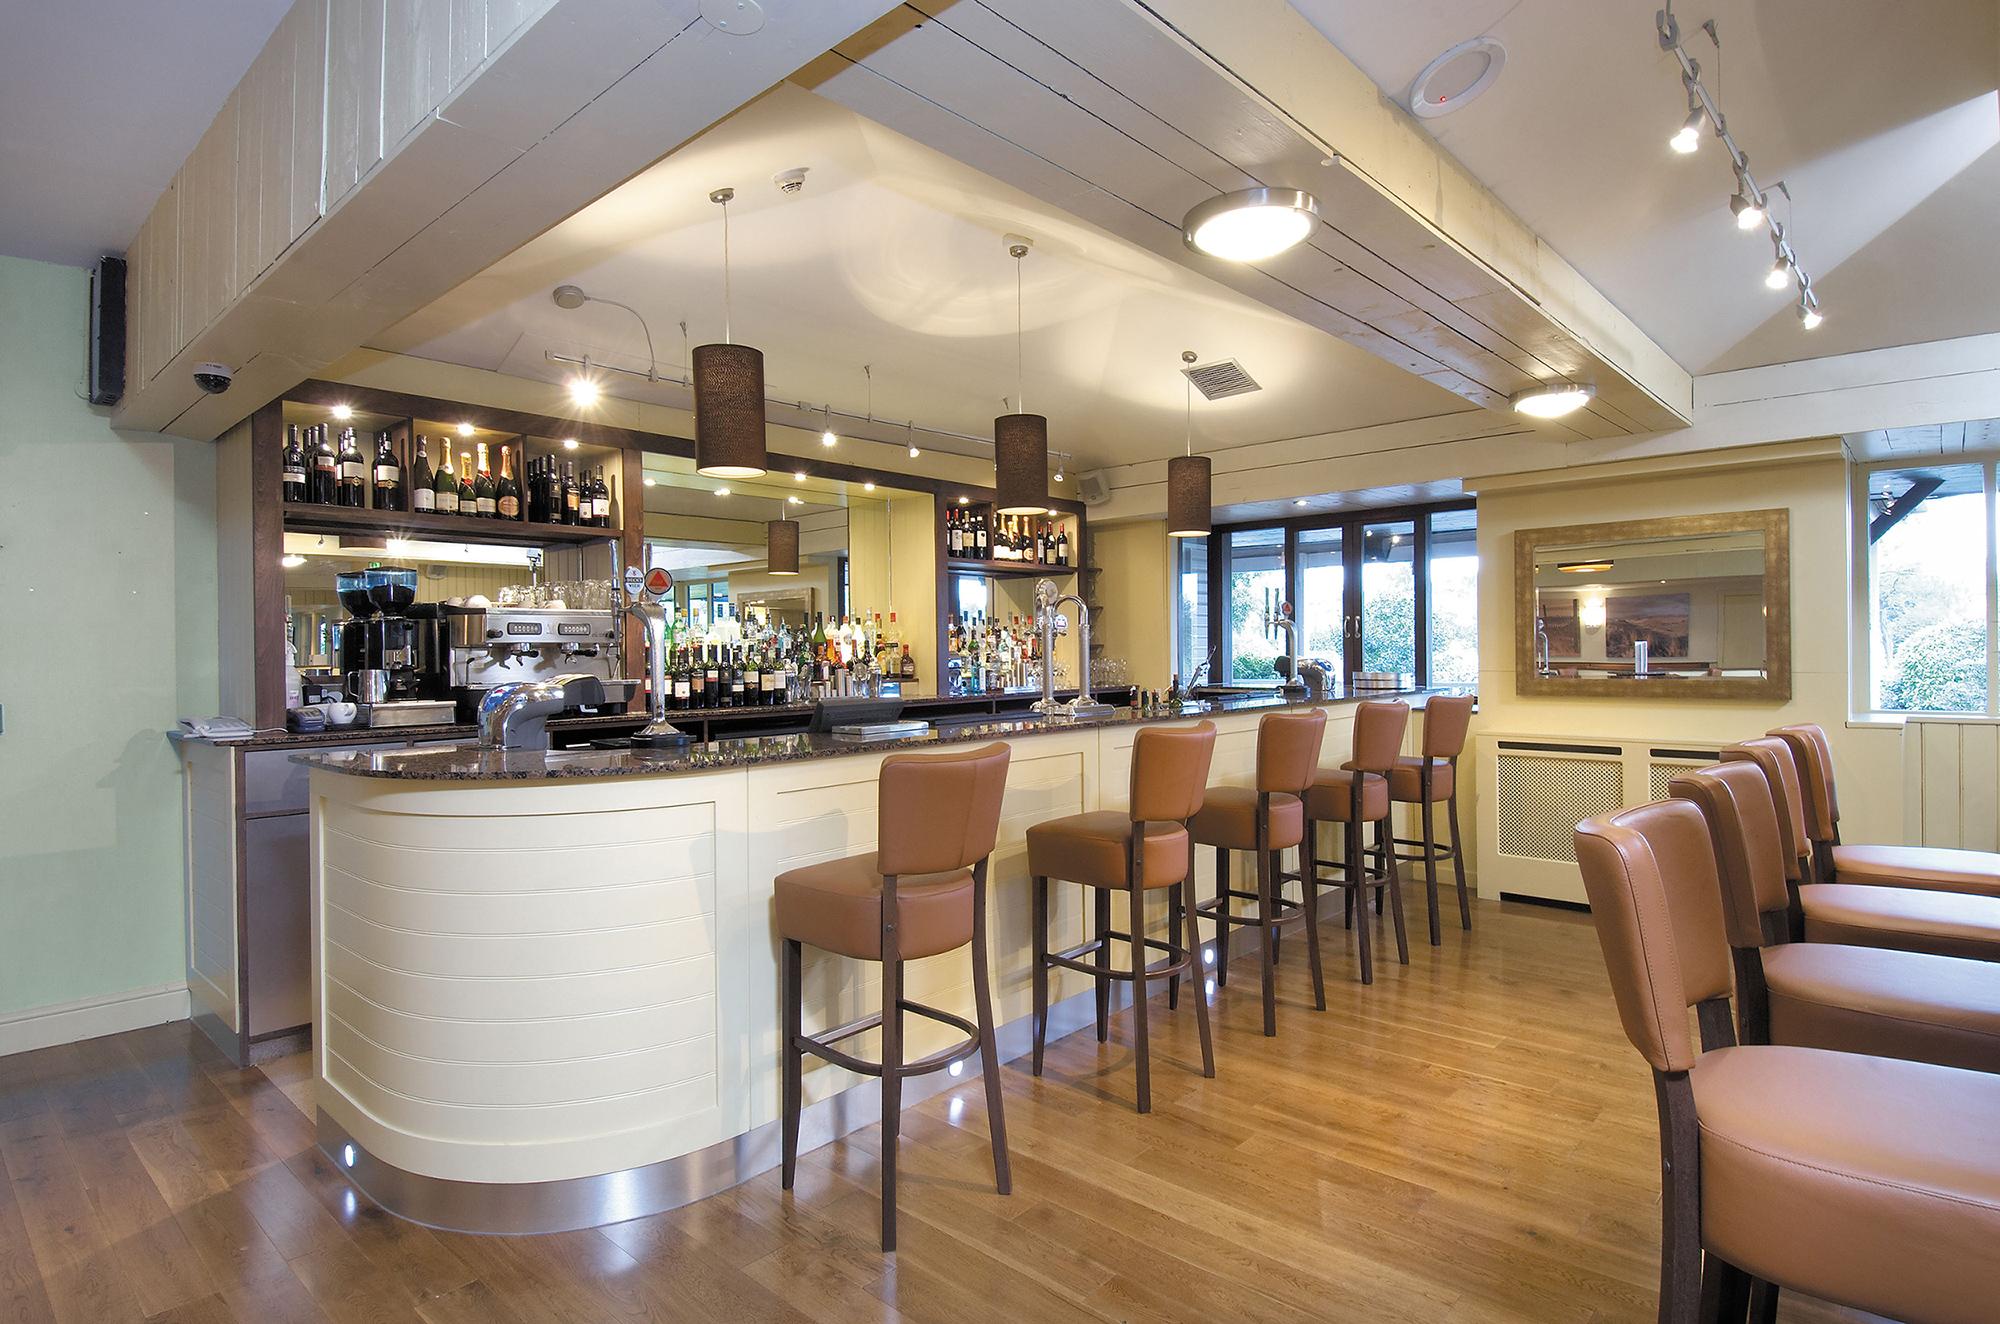 Martha S Grill Amp Bar At The Madison Hotel Rory Cashin